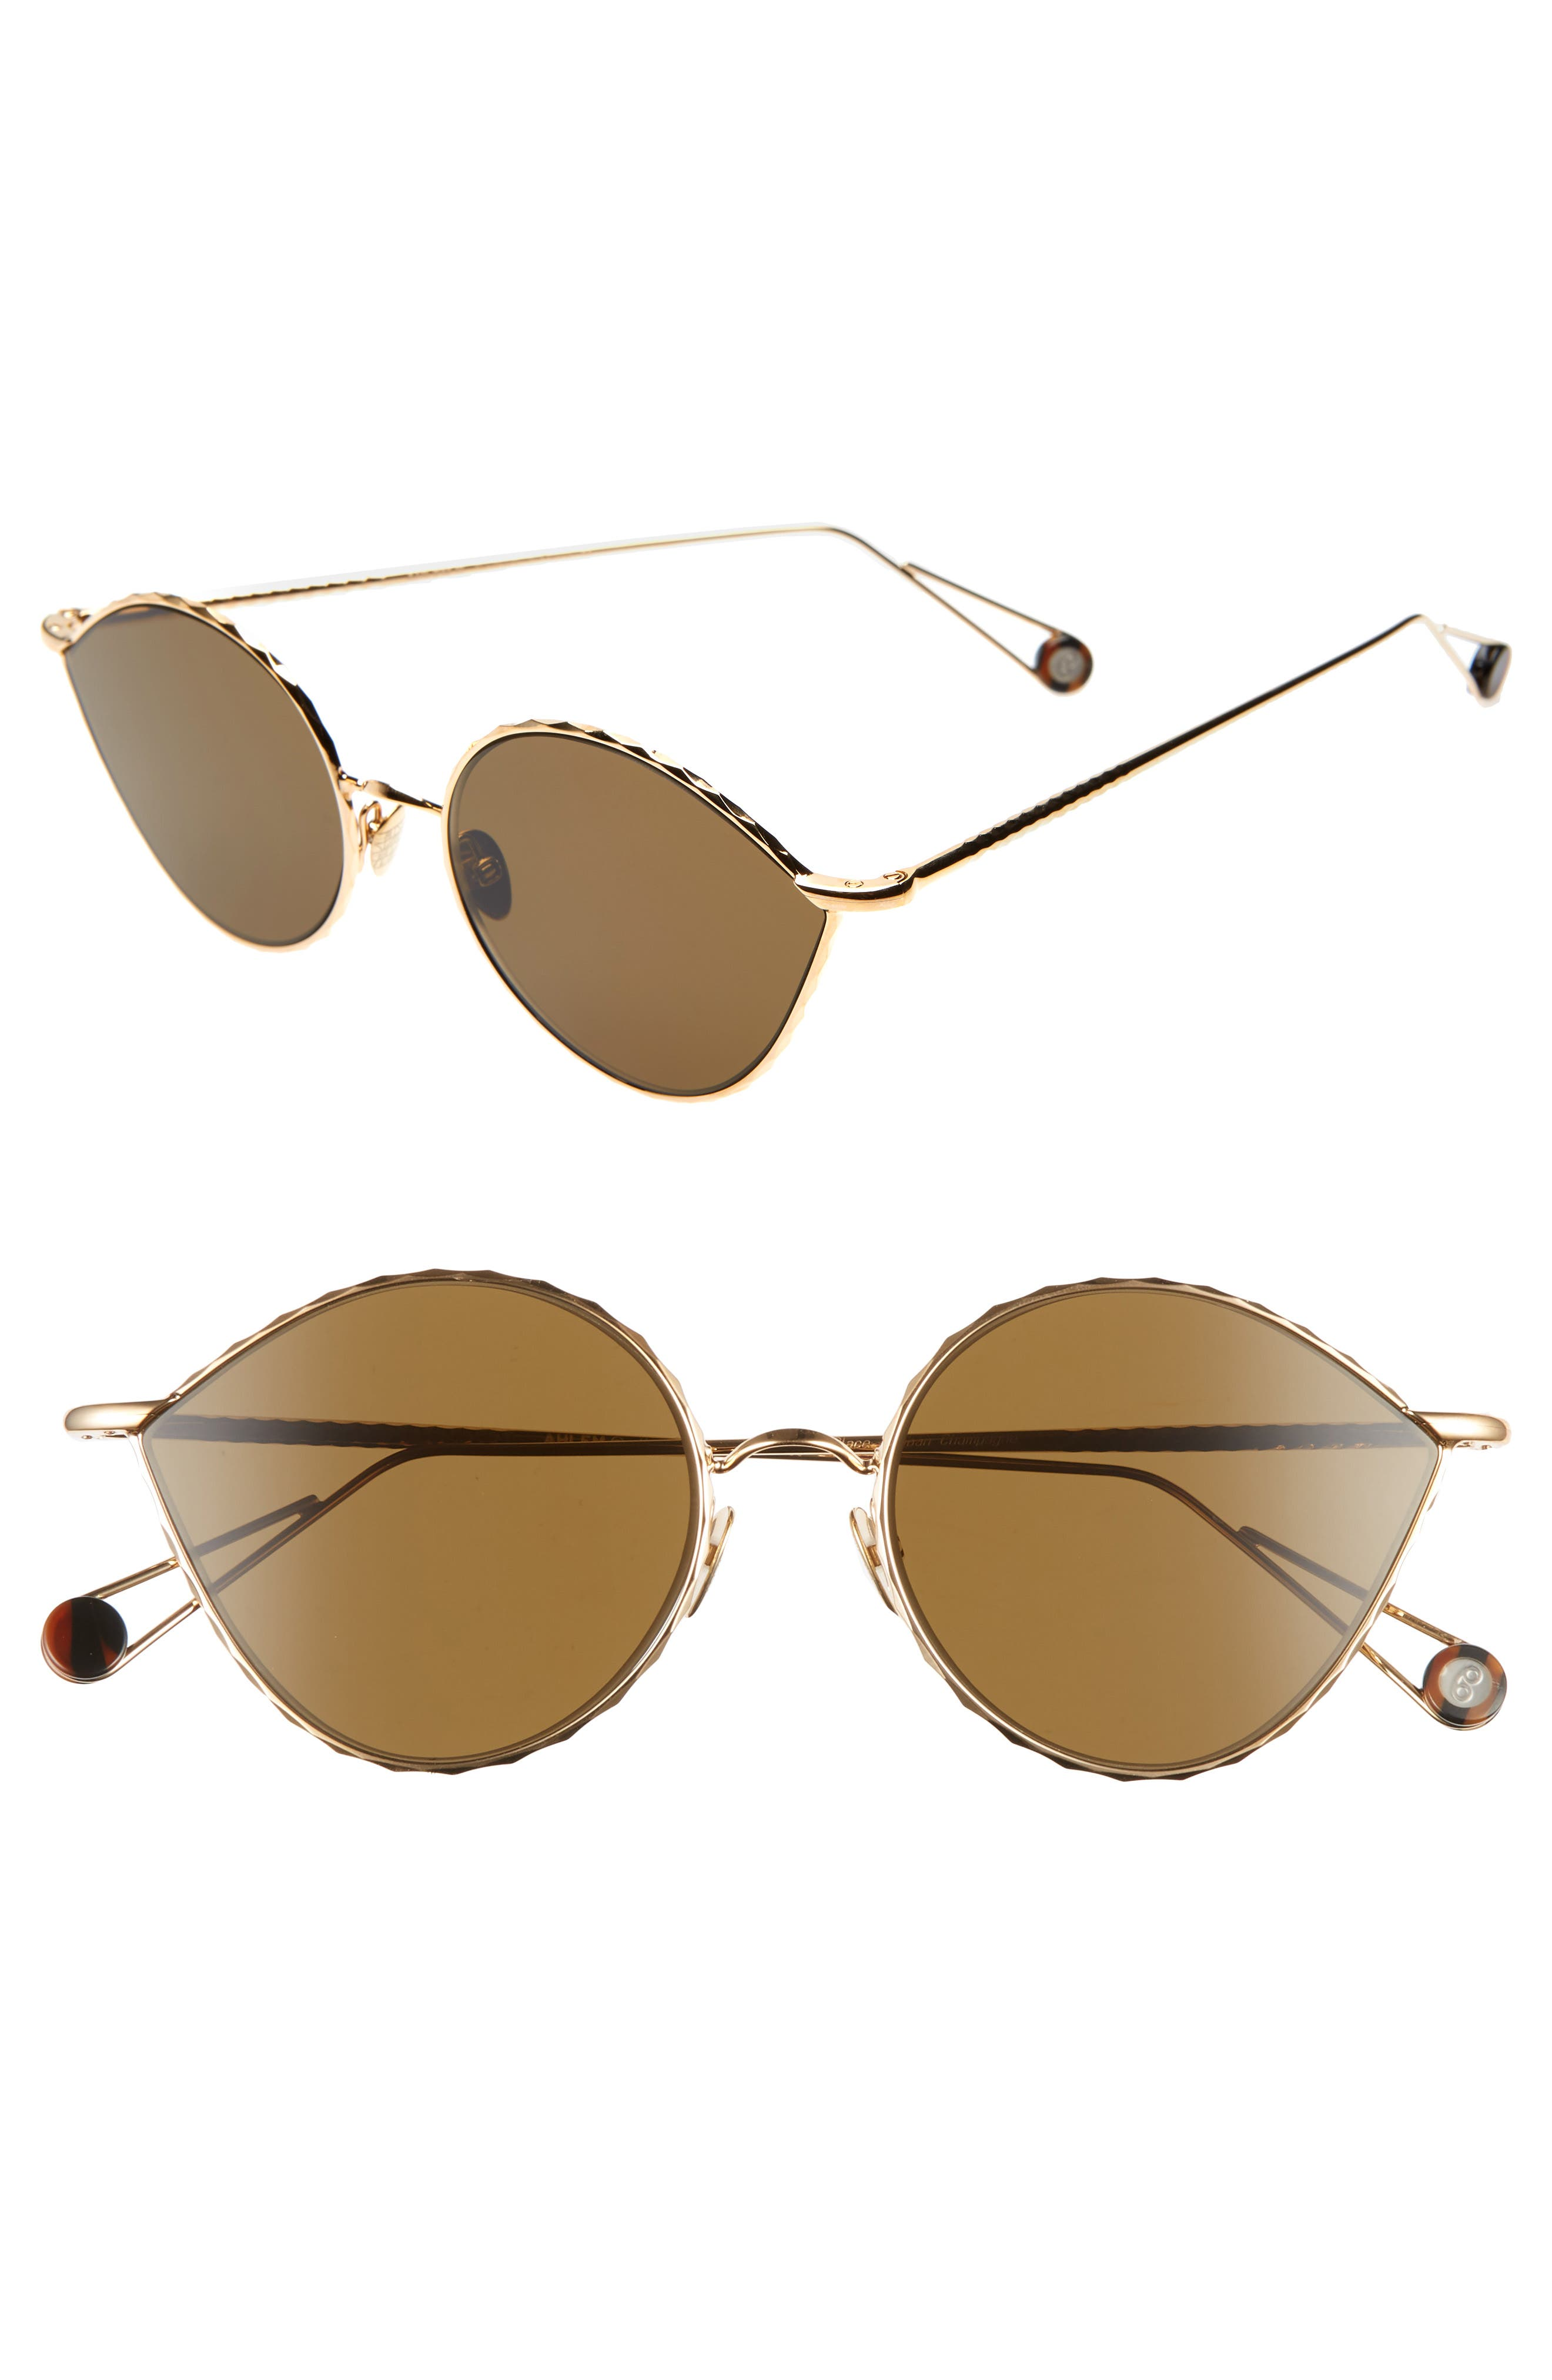 AHLEM Place Vauban 52Mm Cat Eye Sunglasses - Yellow Gold